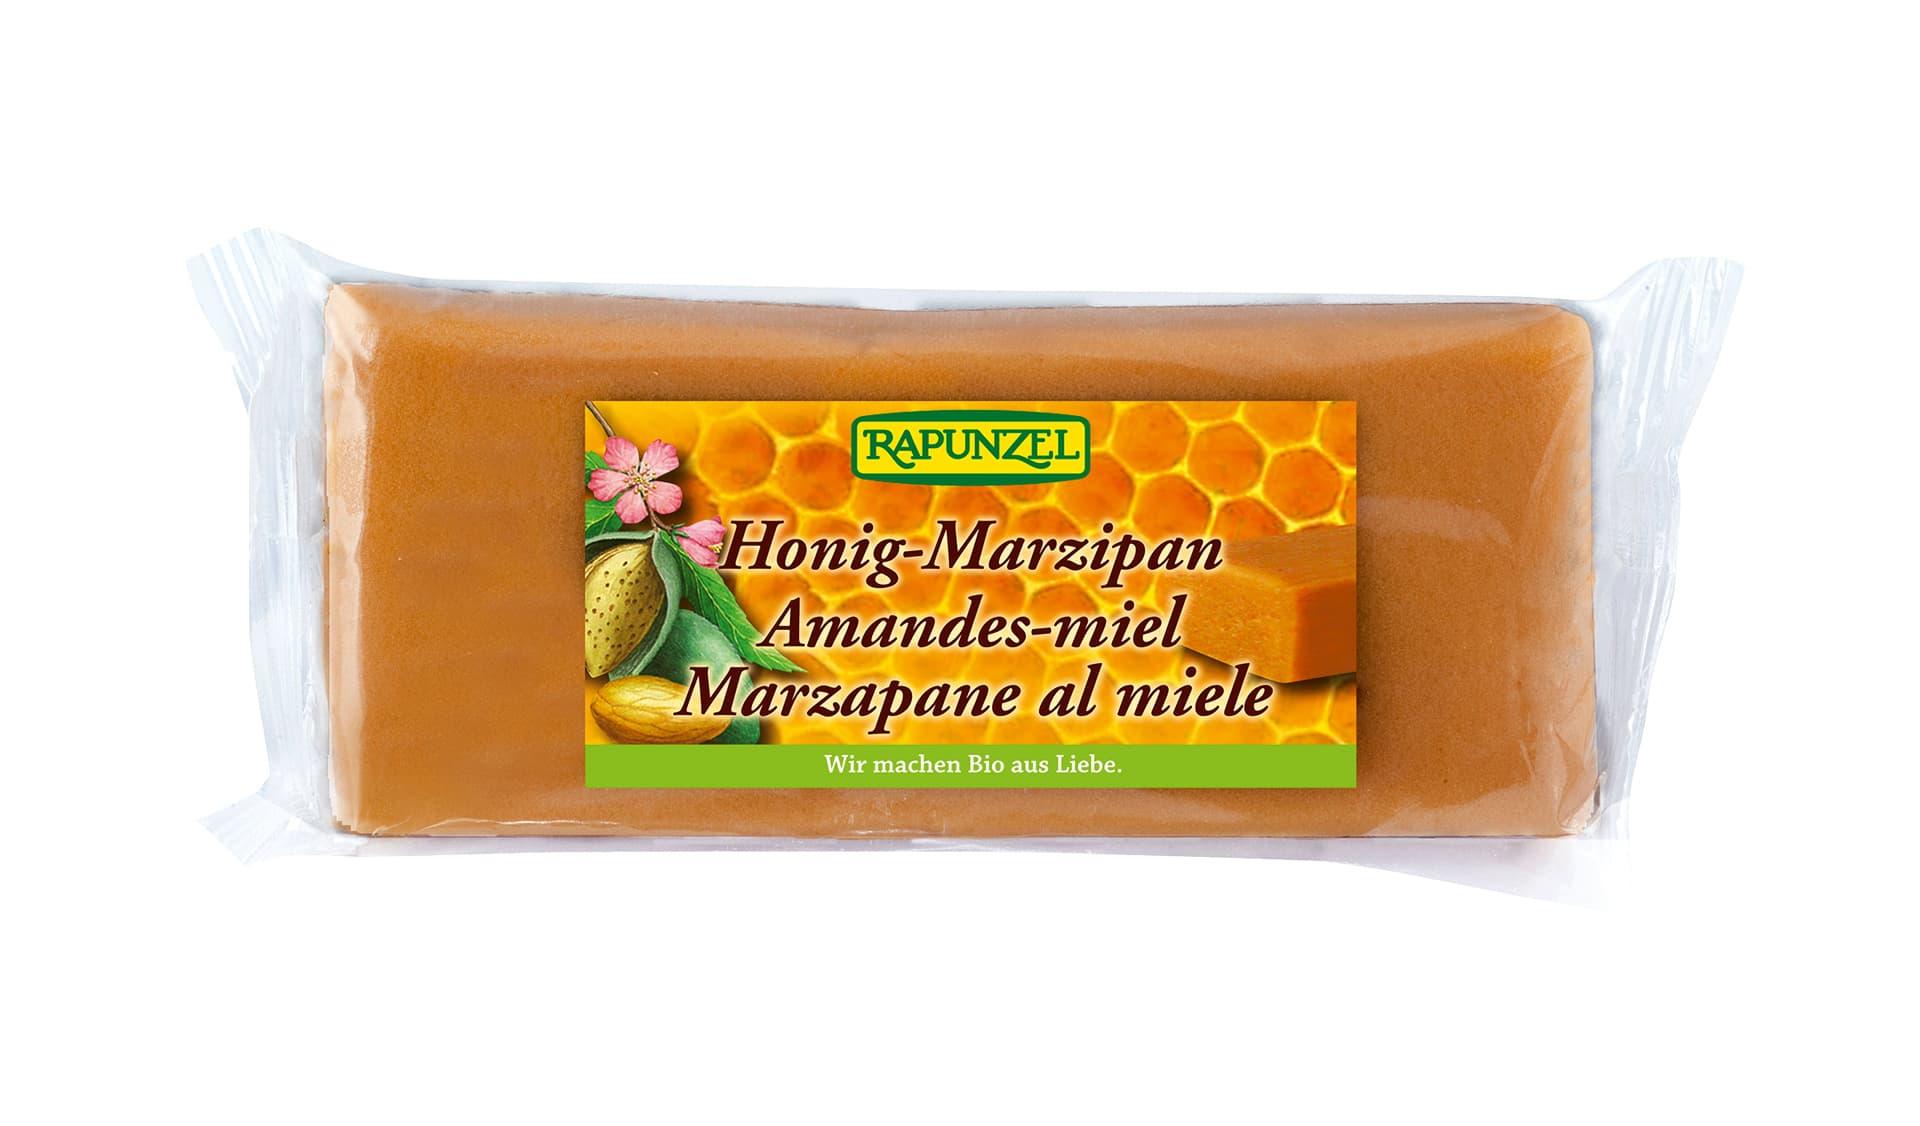 Rapunzel Honig-Marzipan (www.rapunzel.de)